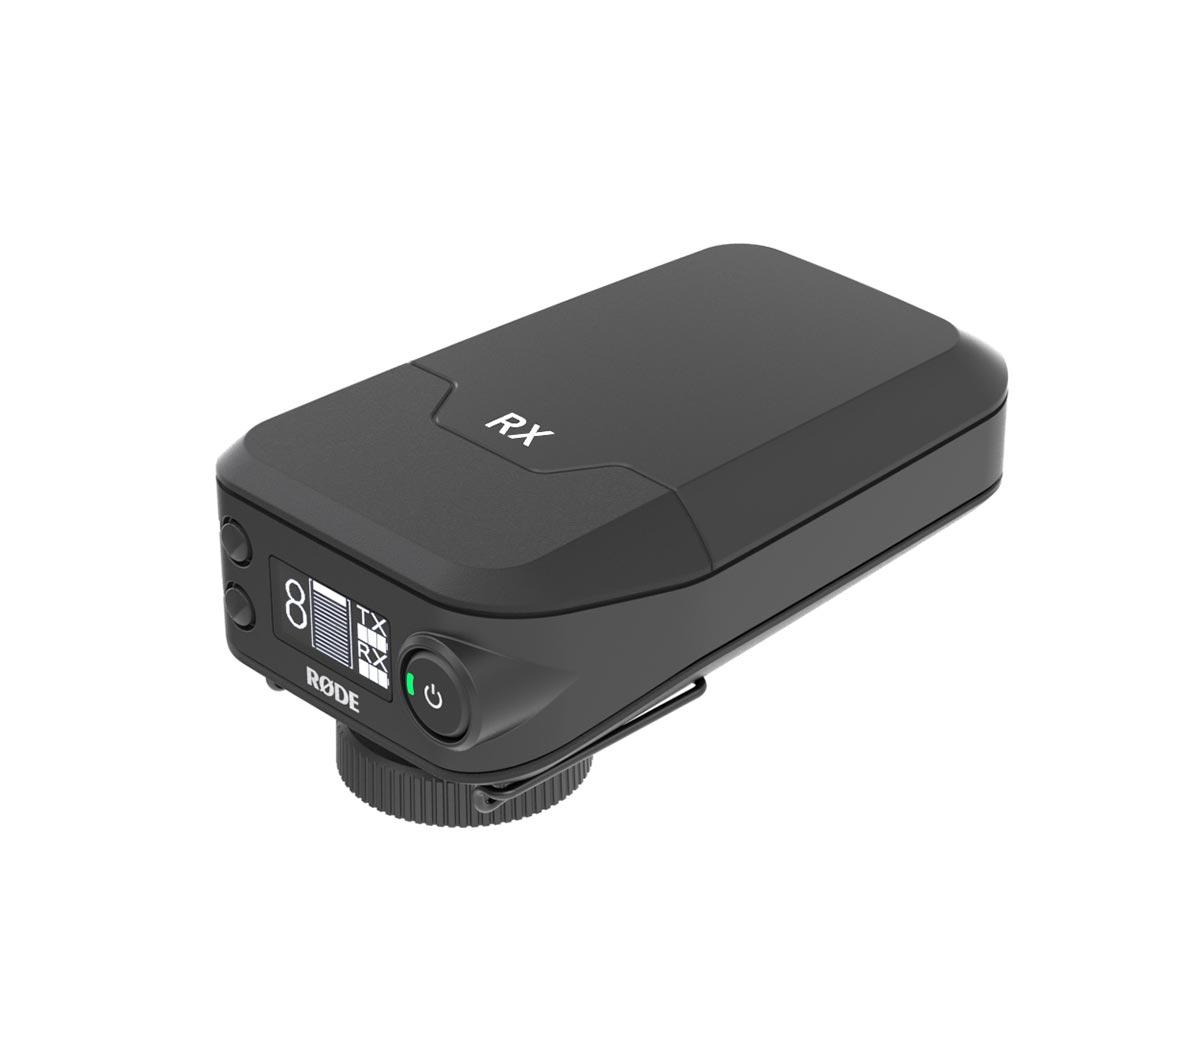 Il ricevitore del Filmaker Kit: si noti l'ampio OLED